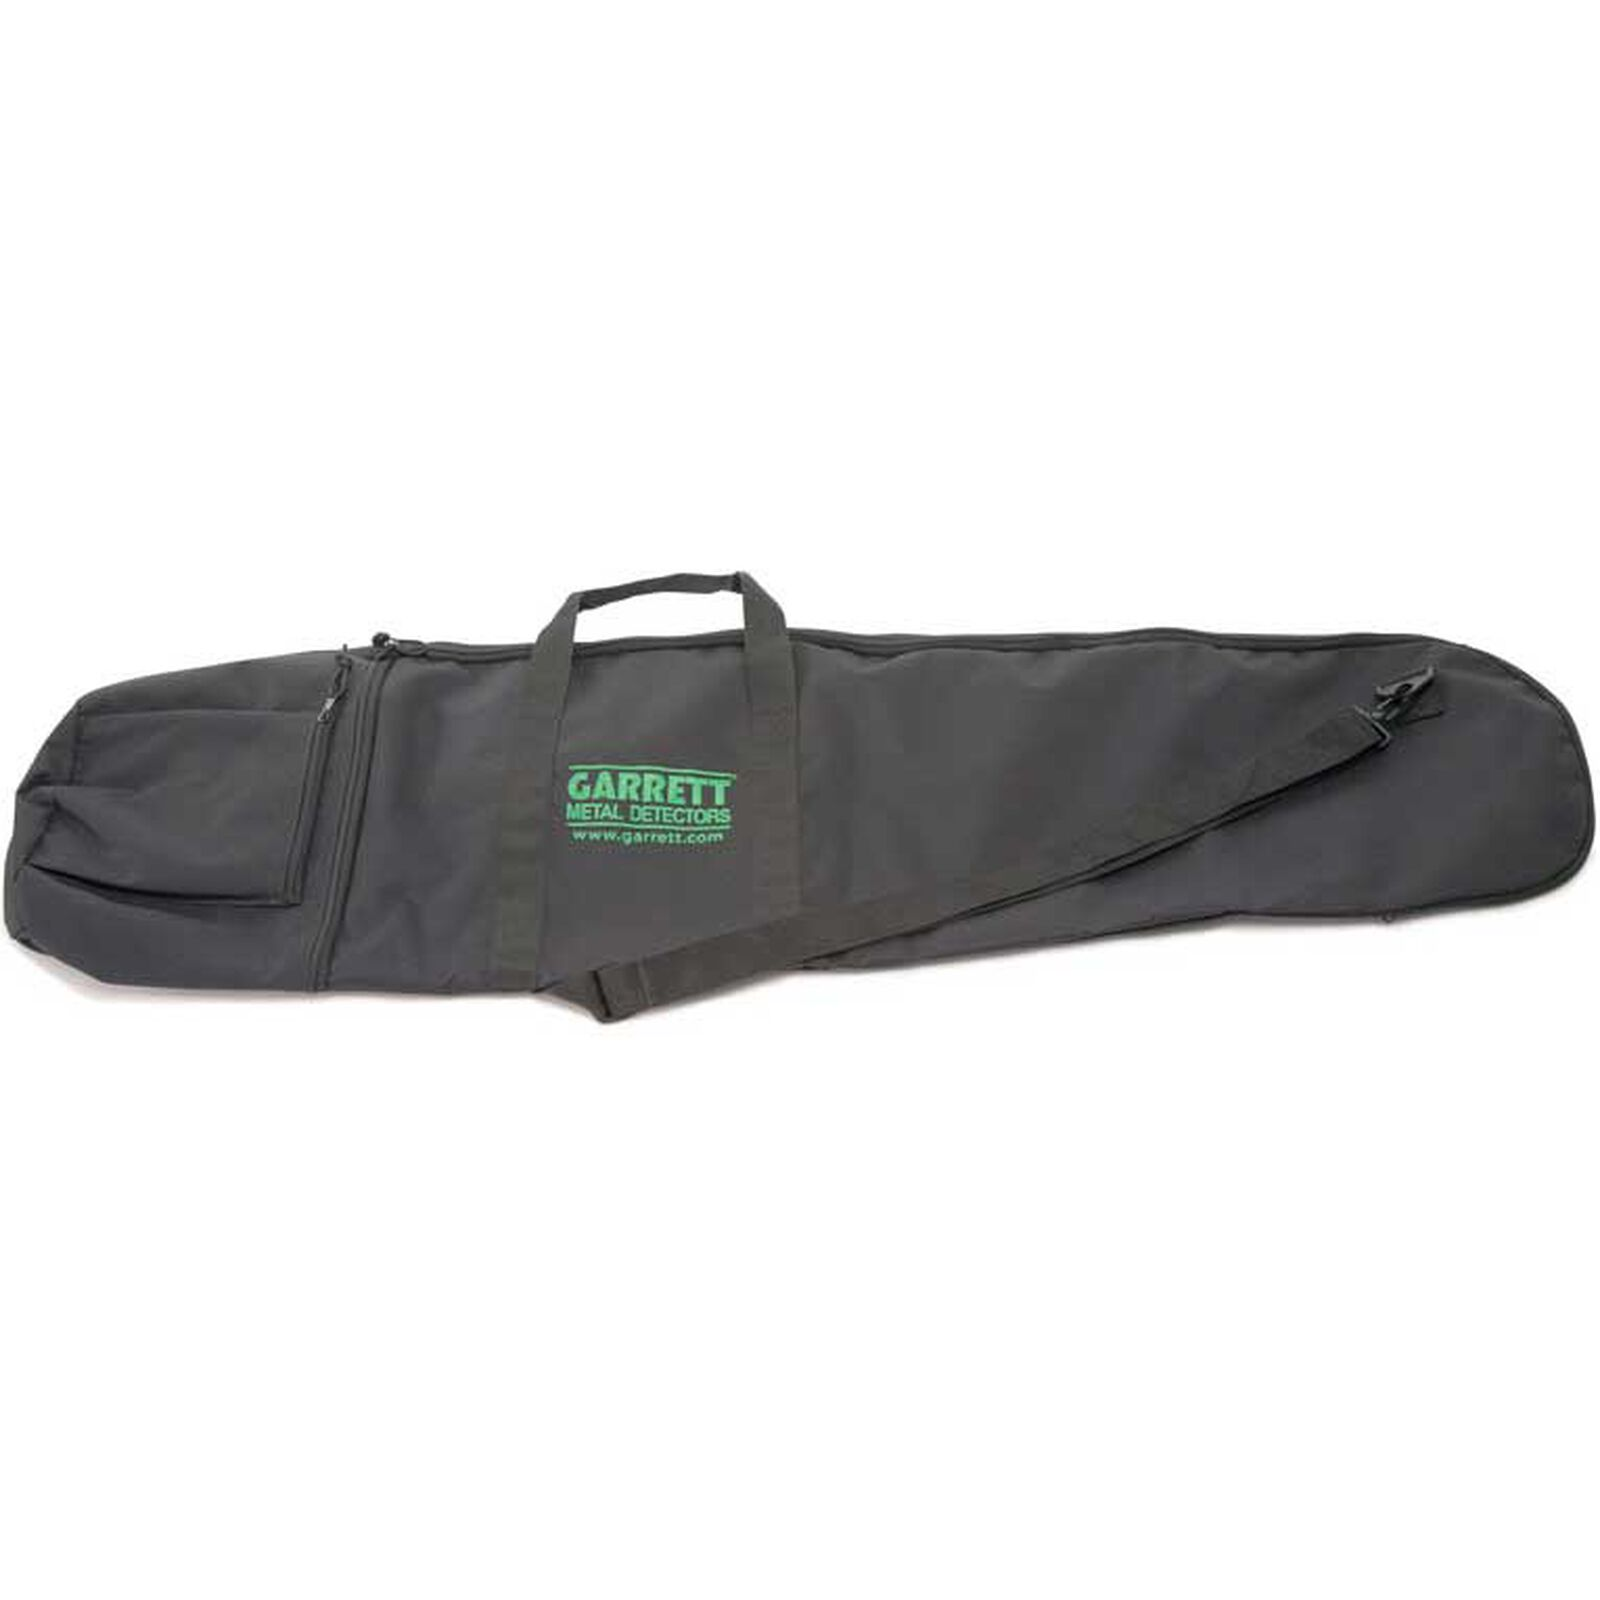 All-Purpose Carry Bag